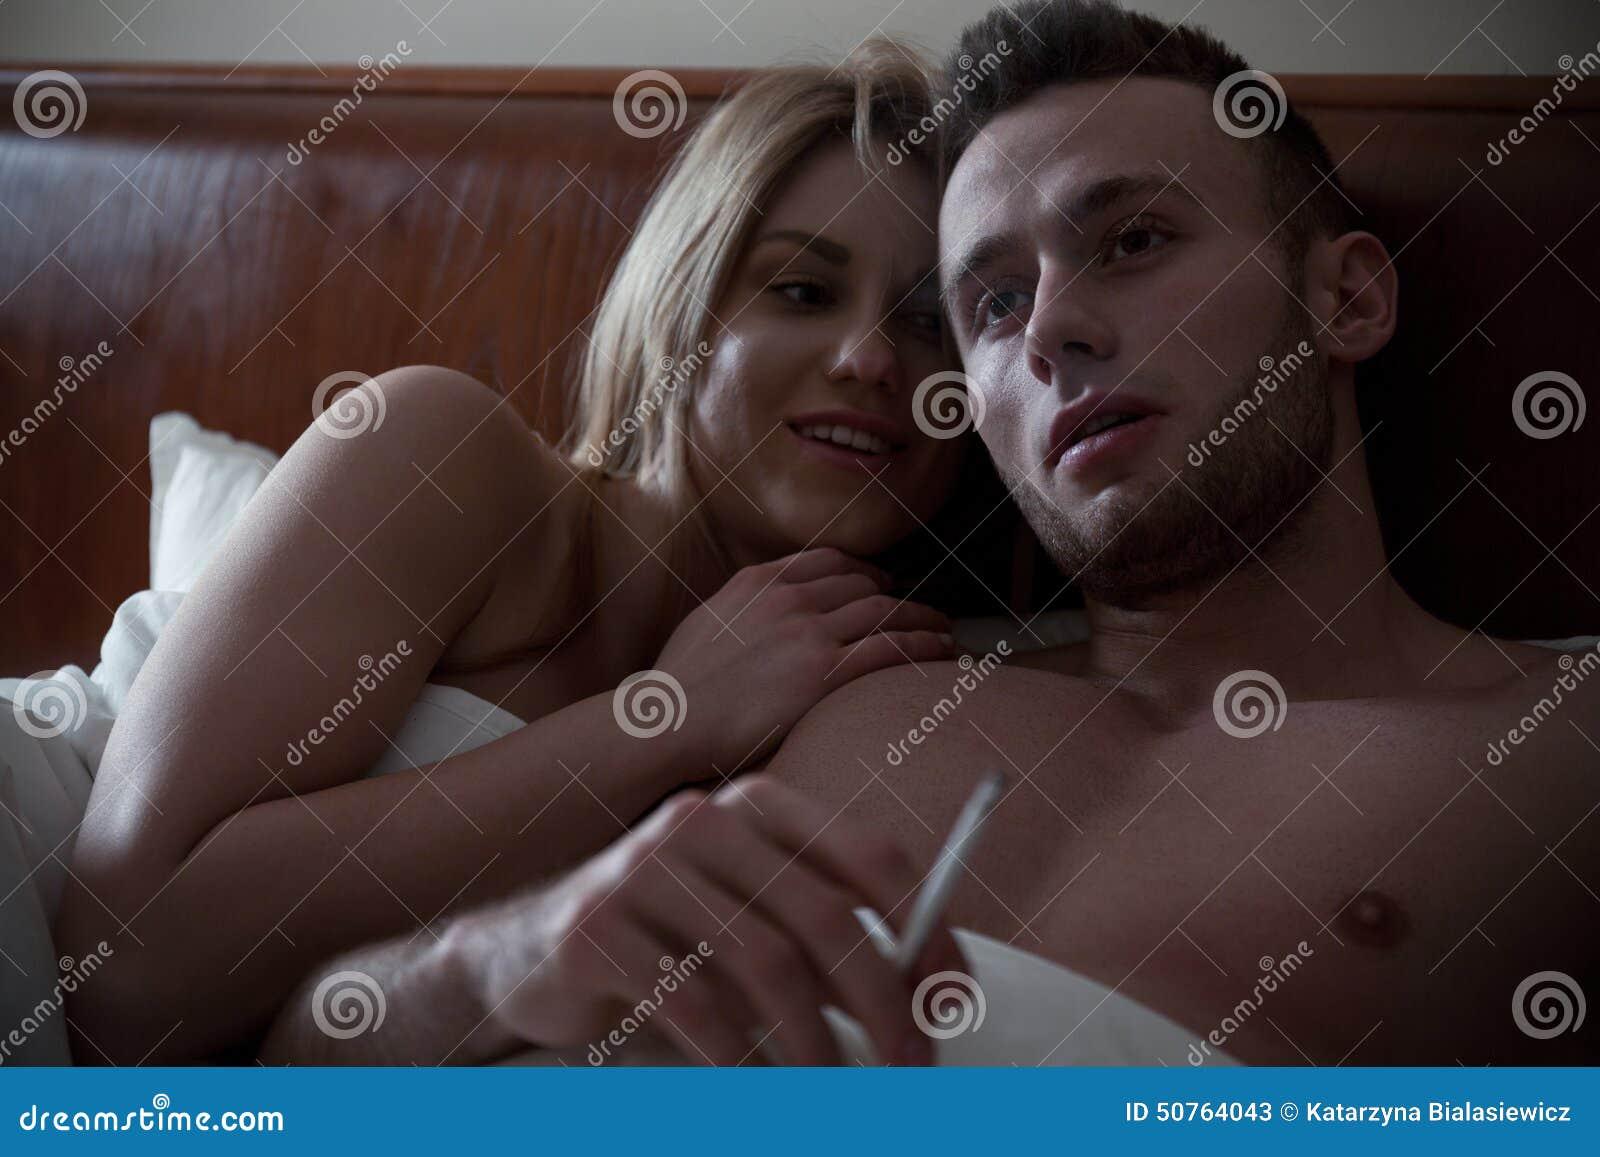 Frauen rauchen Zigaretten Sex